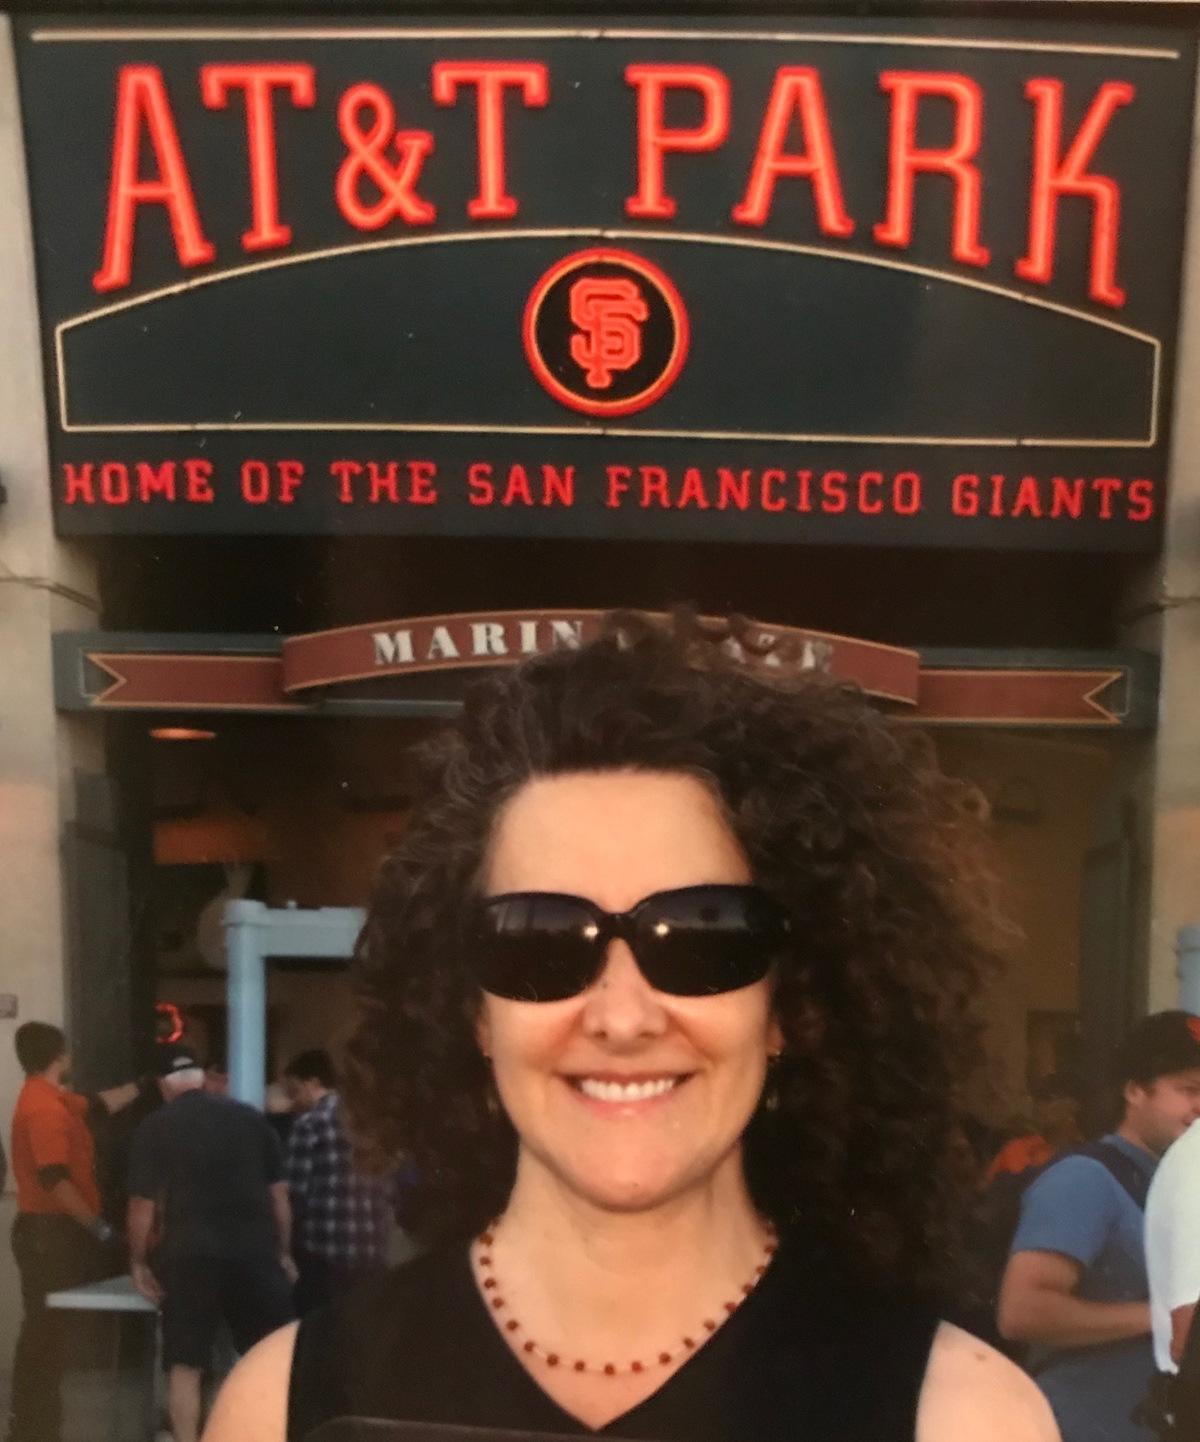 (Nancy Levine (me) at San Francisco Giants game, 2016)